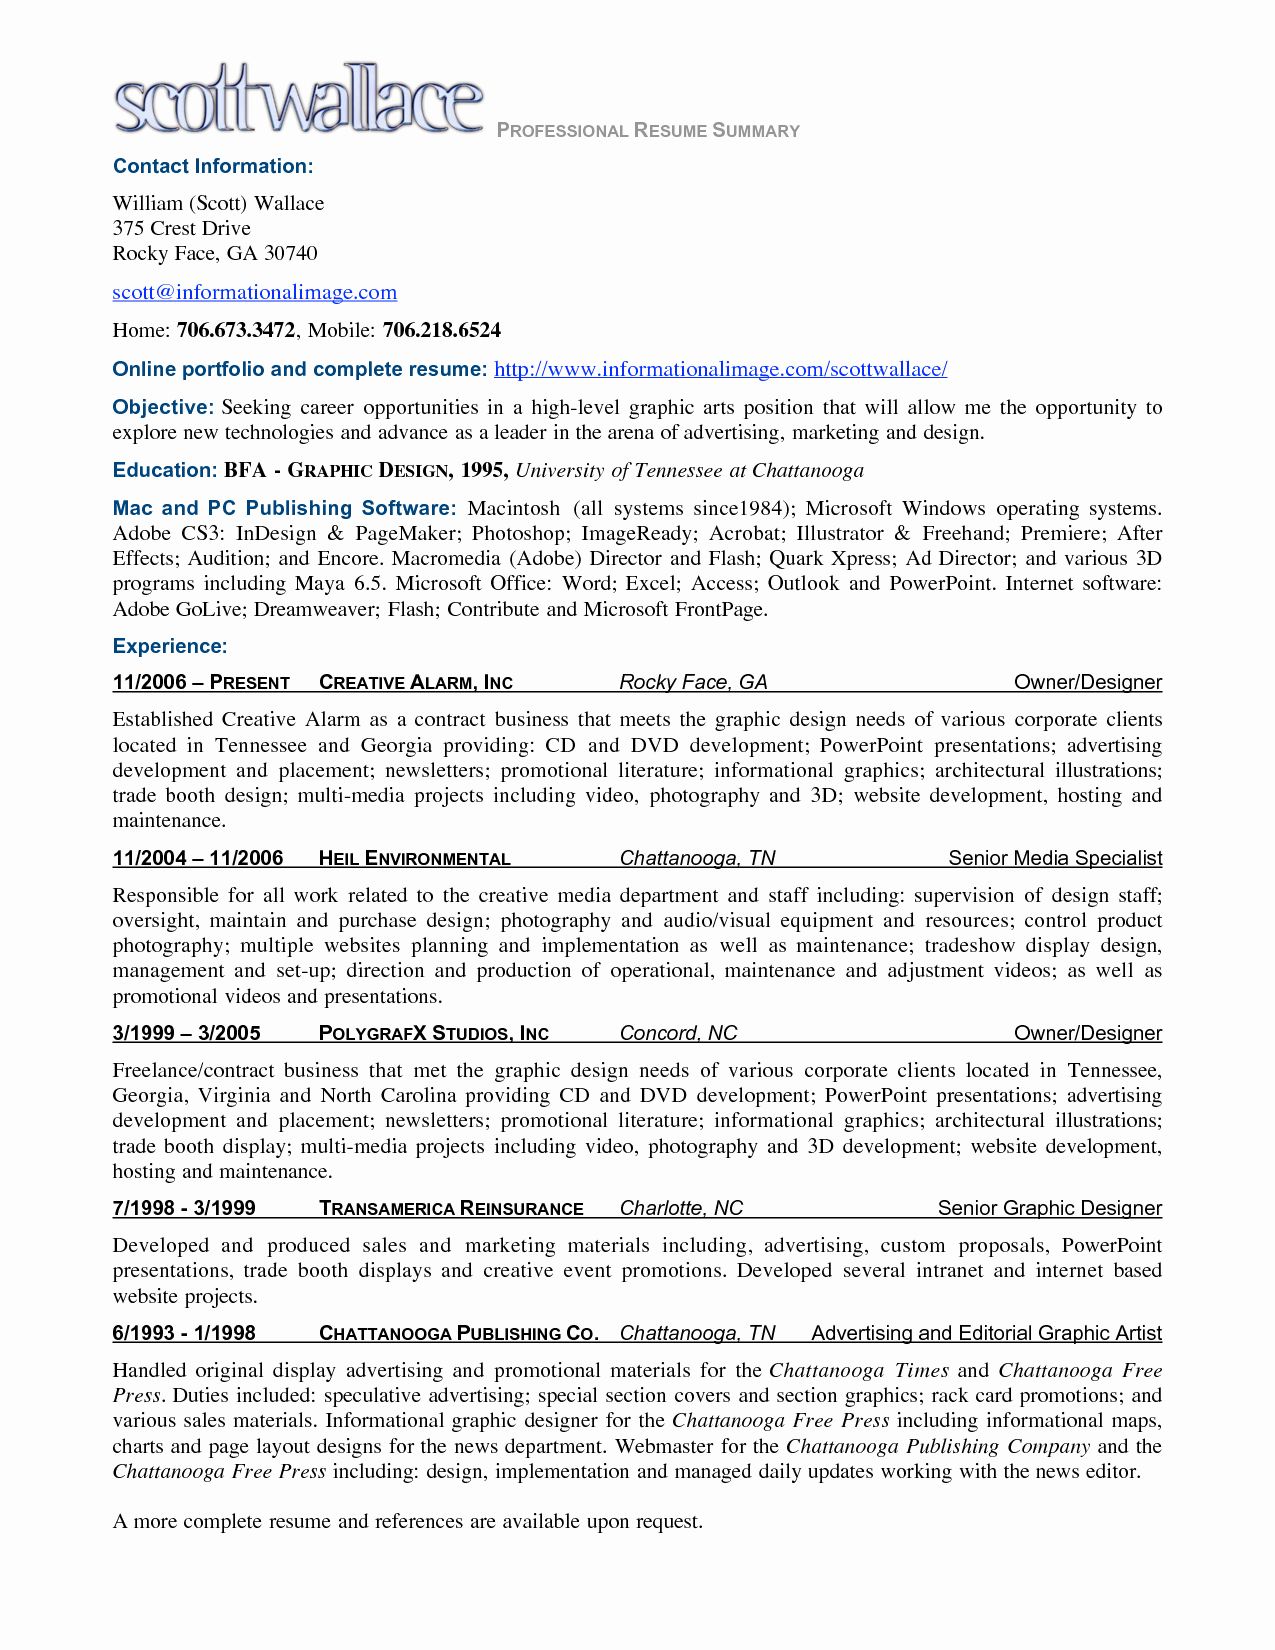 Summary for Resume Examples Samplebusinessresume